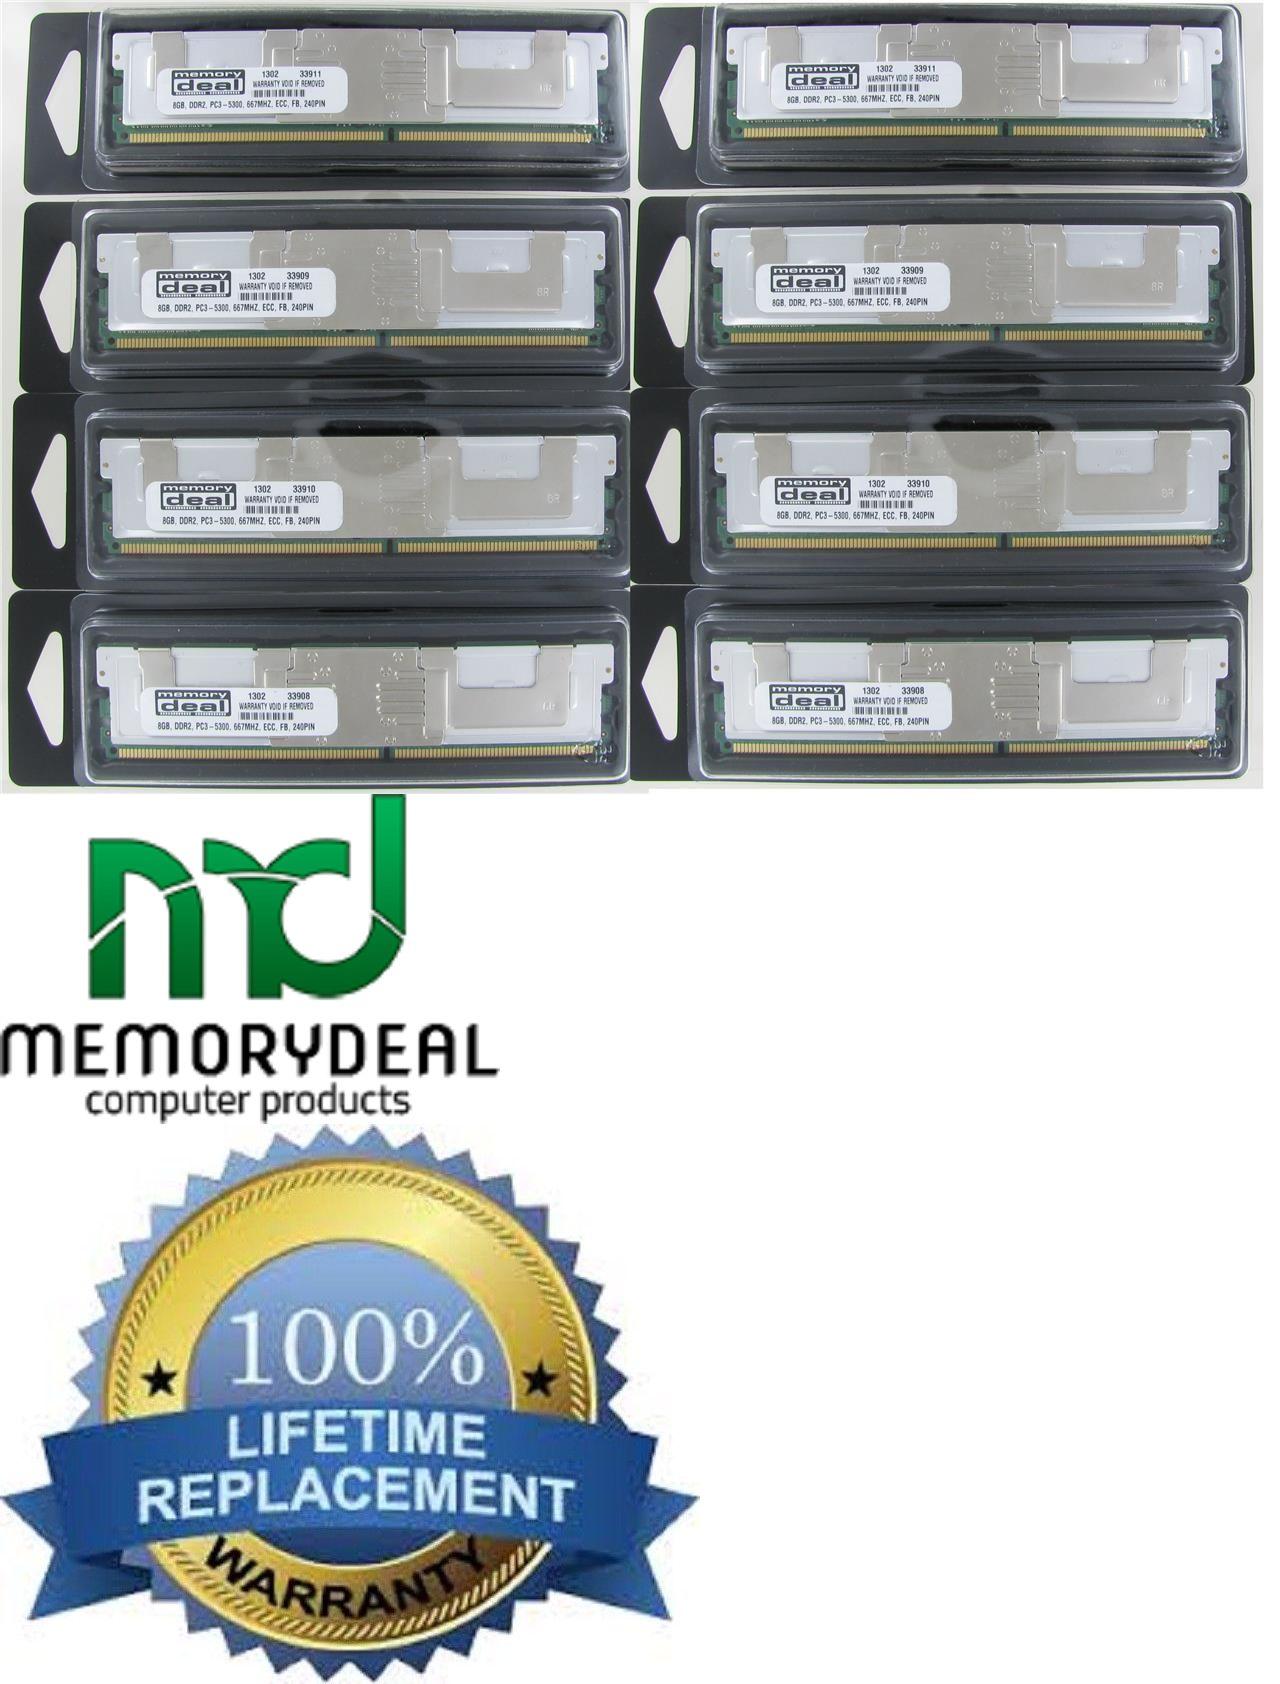 64GB PC2-5300F FBDIMM Memory Dell Poweredge 1950 III 2900 III 2950III 8X8GB